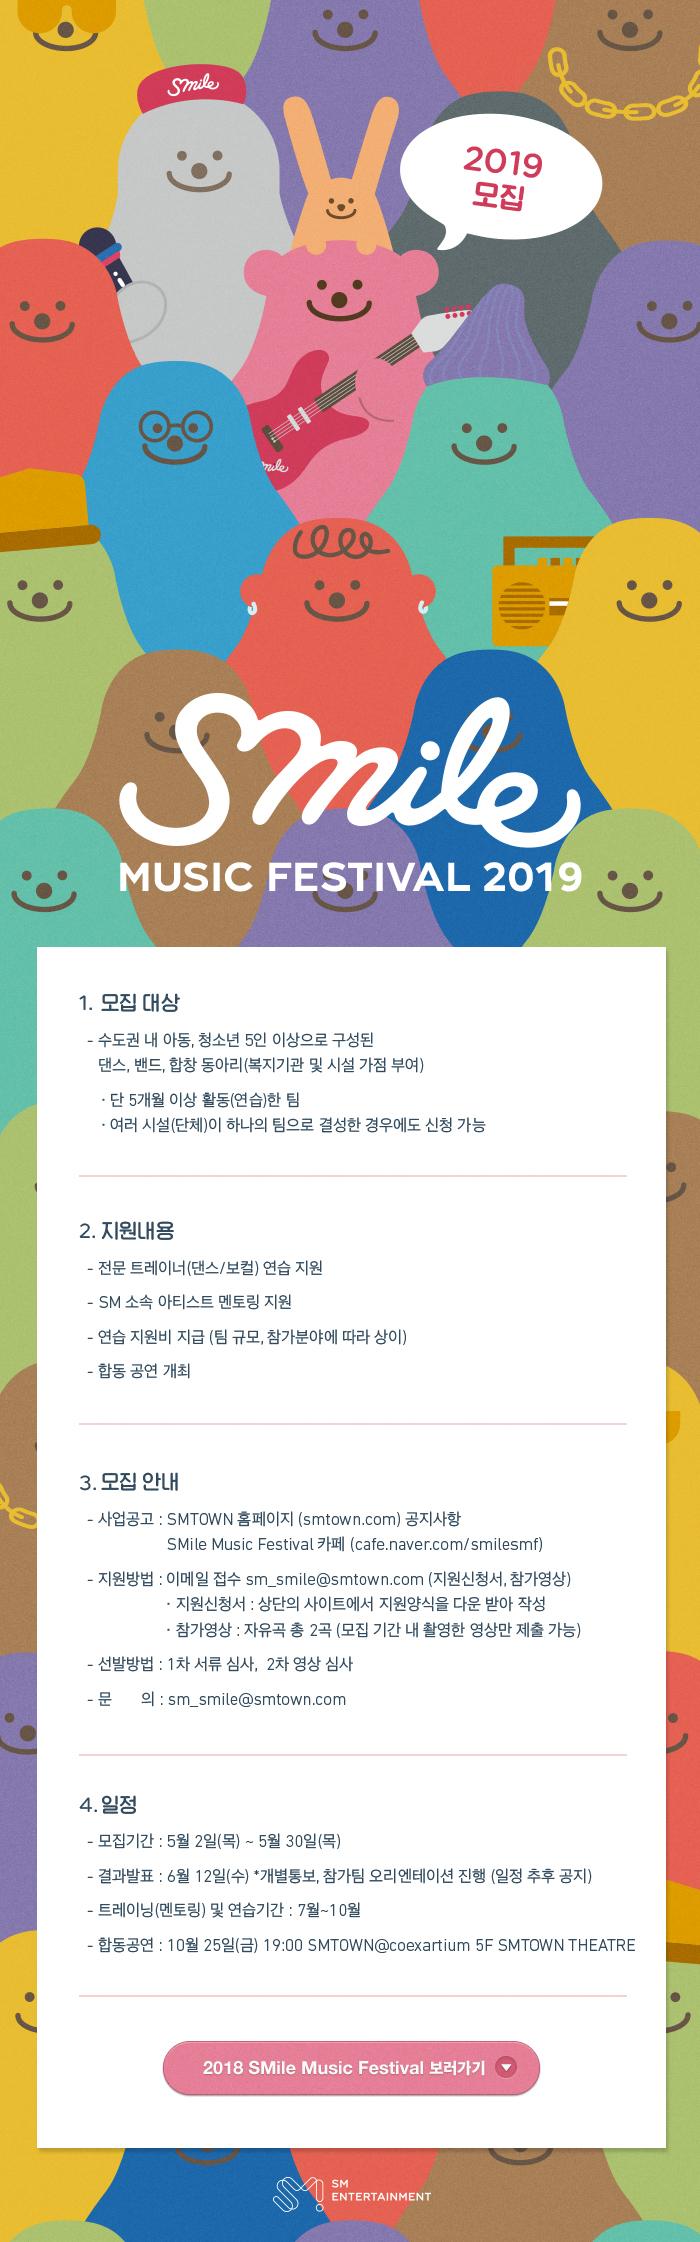 2. 2019 SMile Music Festival 모집포스터.jpg